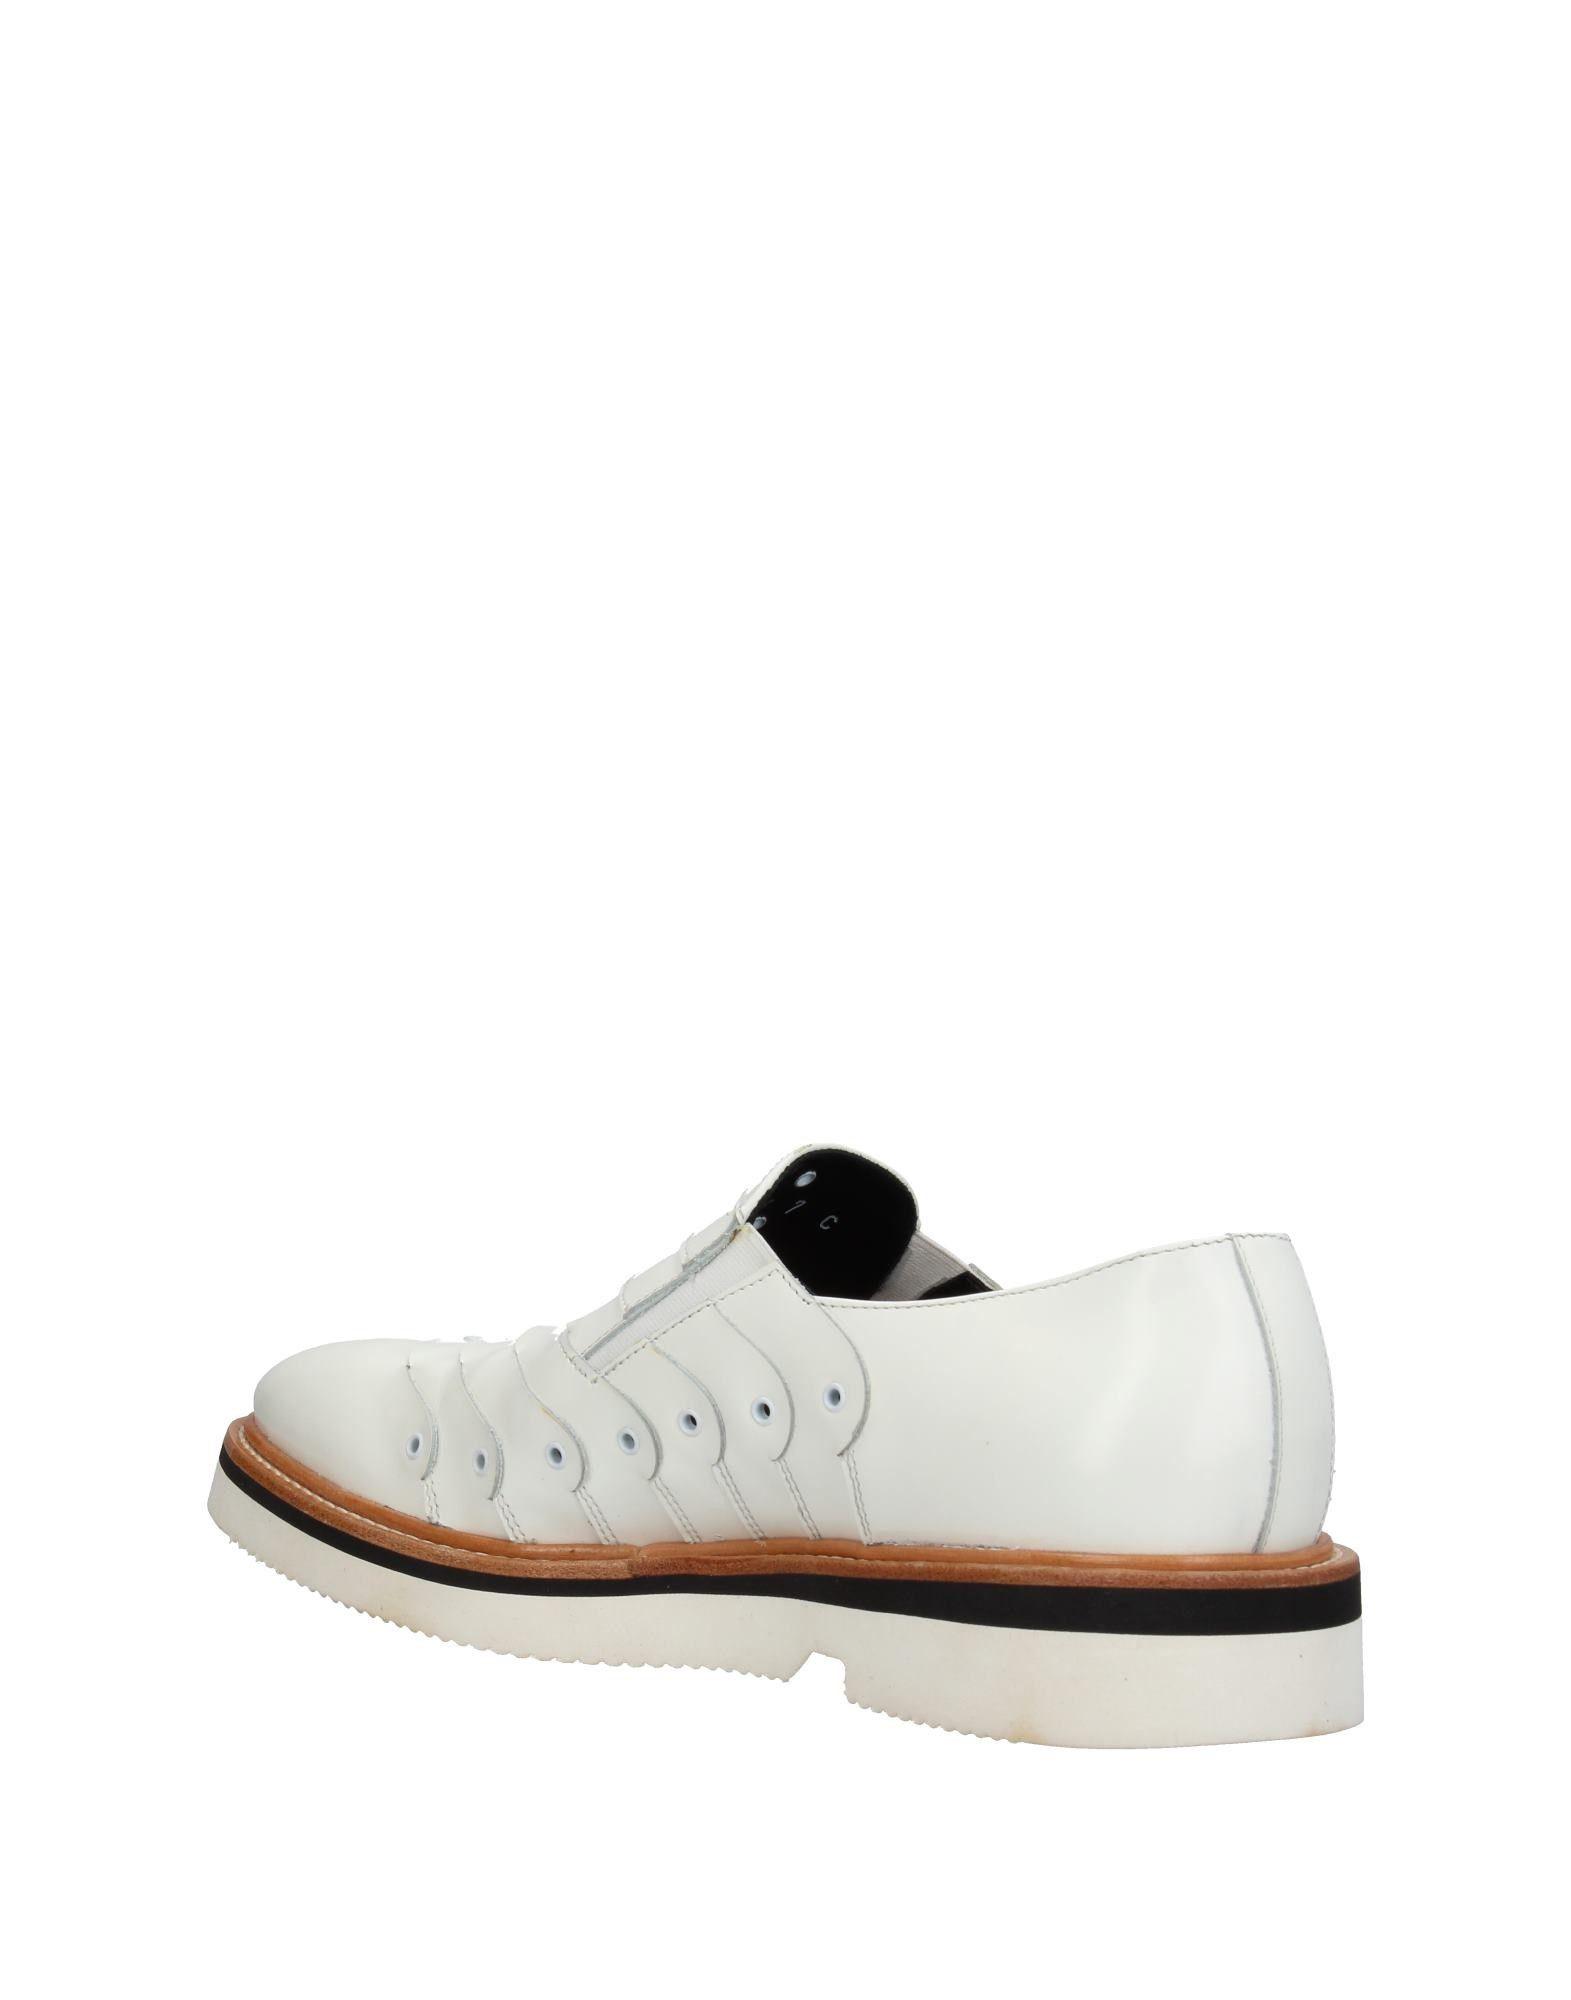 Cesare Paciotti Mokassins Herren  11386692FF Gute Qualität beliebte Schuhe